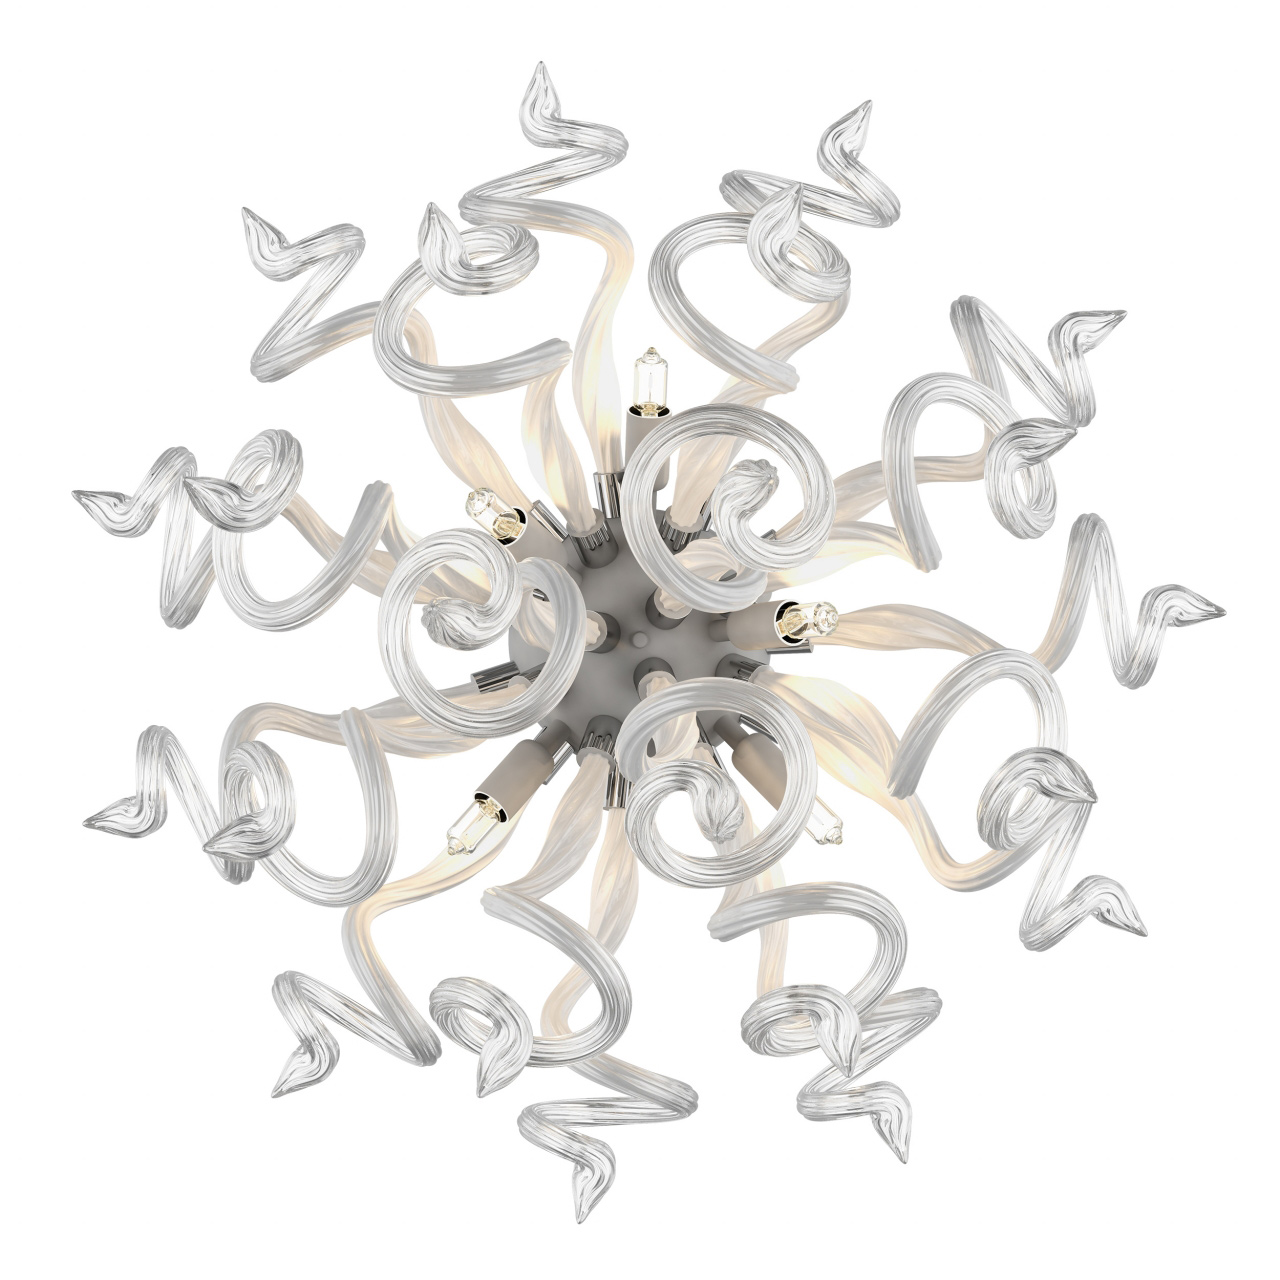 Бра Medusa 5х40W G9 белый / прозрачный Lightstar 890650